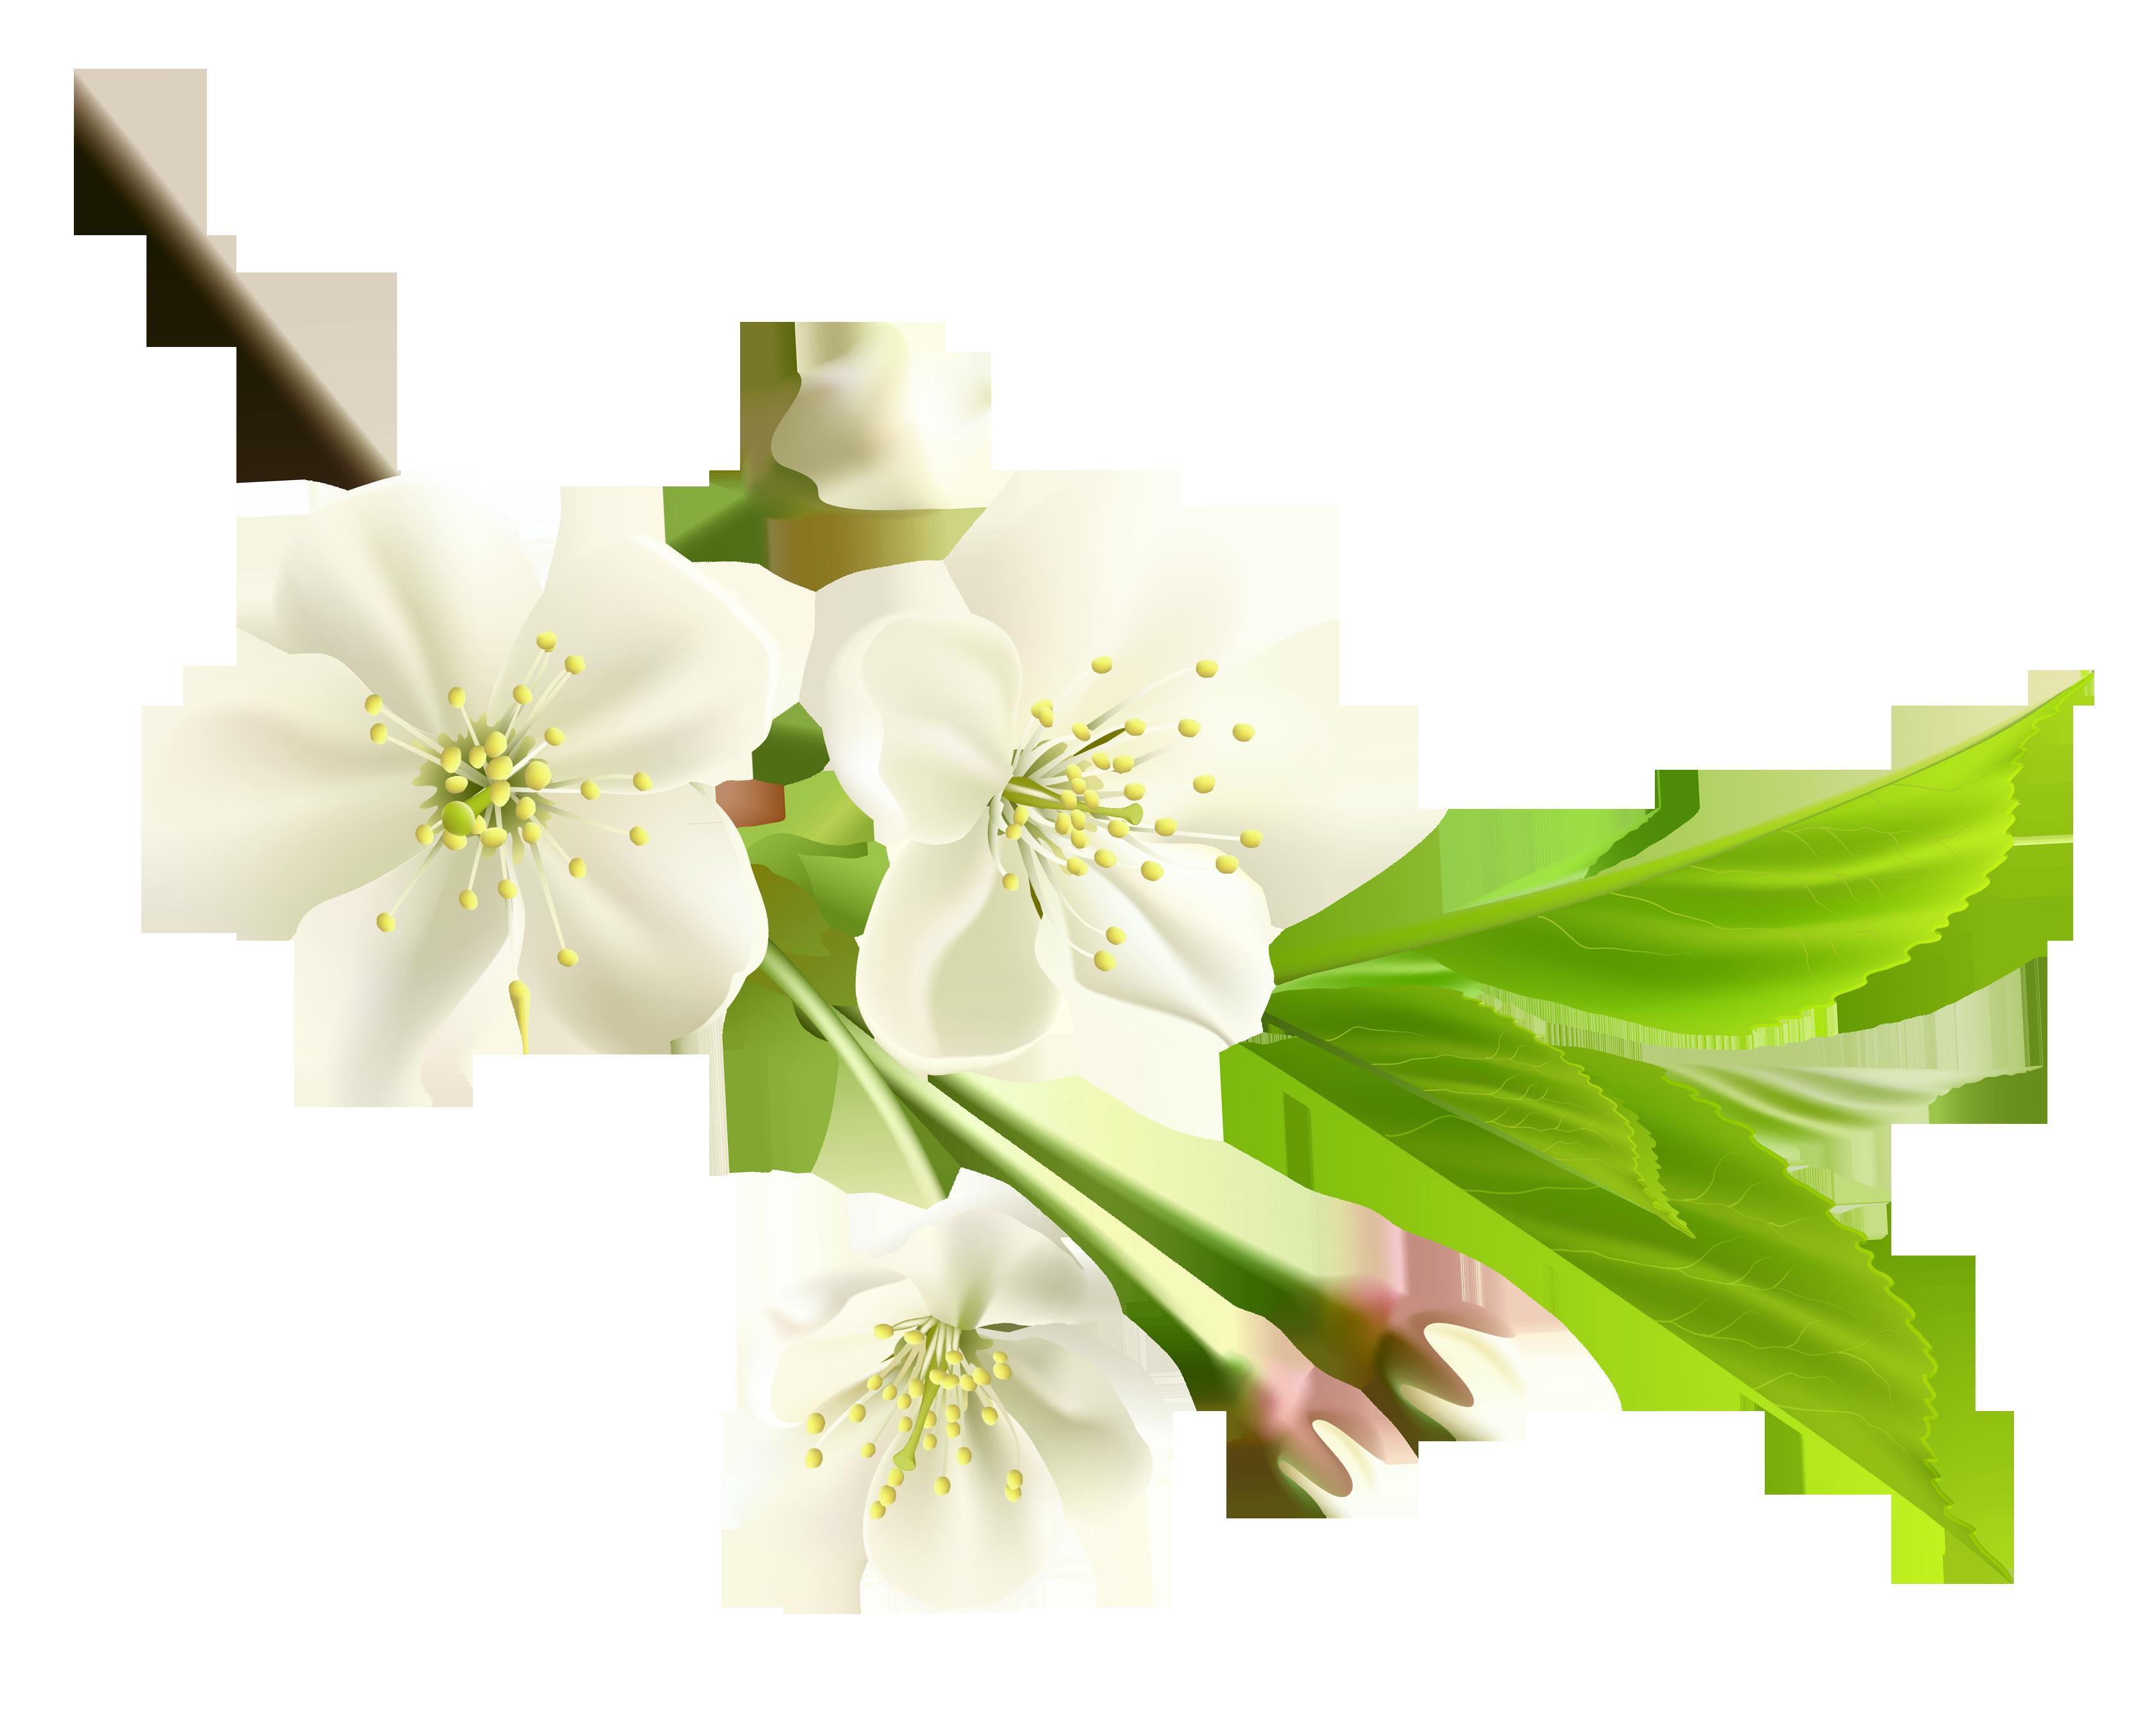 Spring branch clipart #11